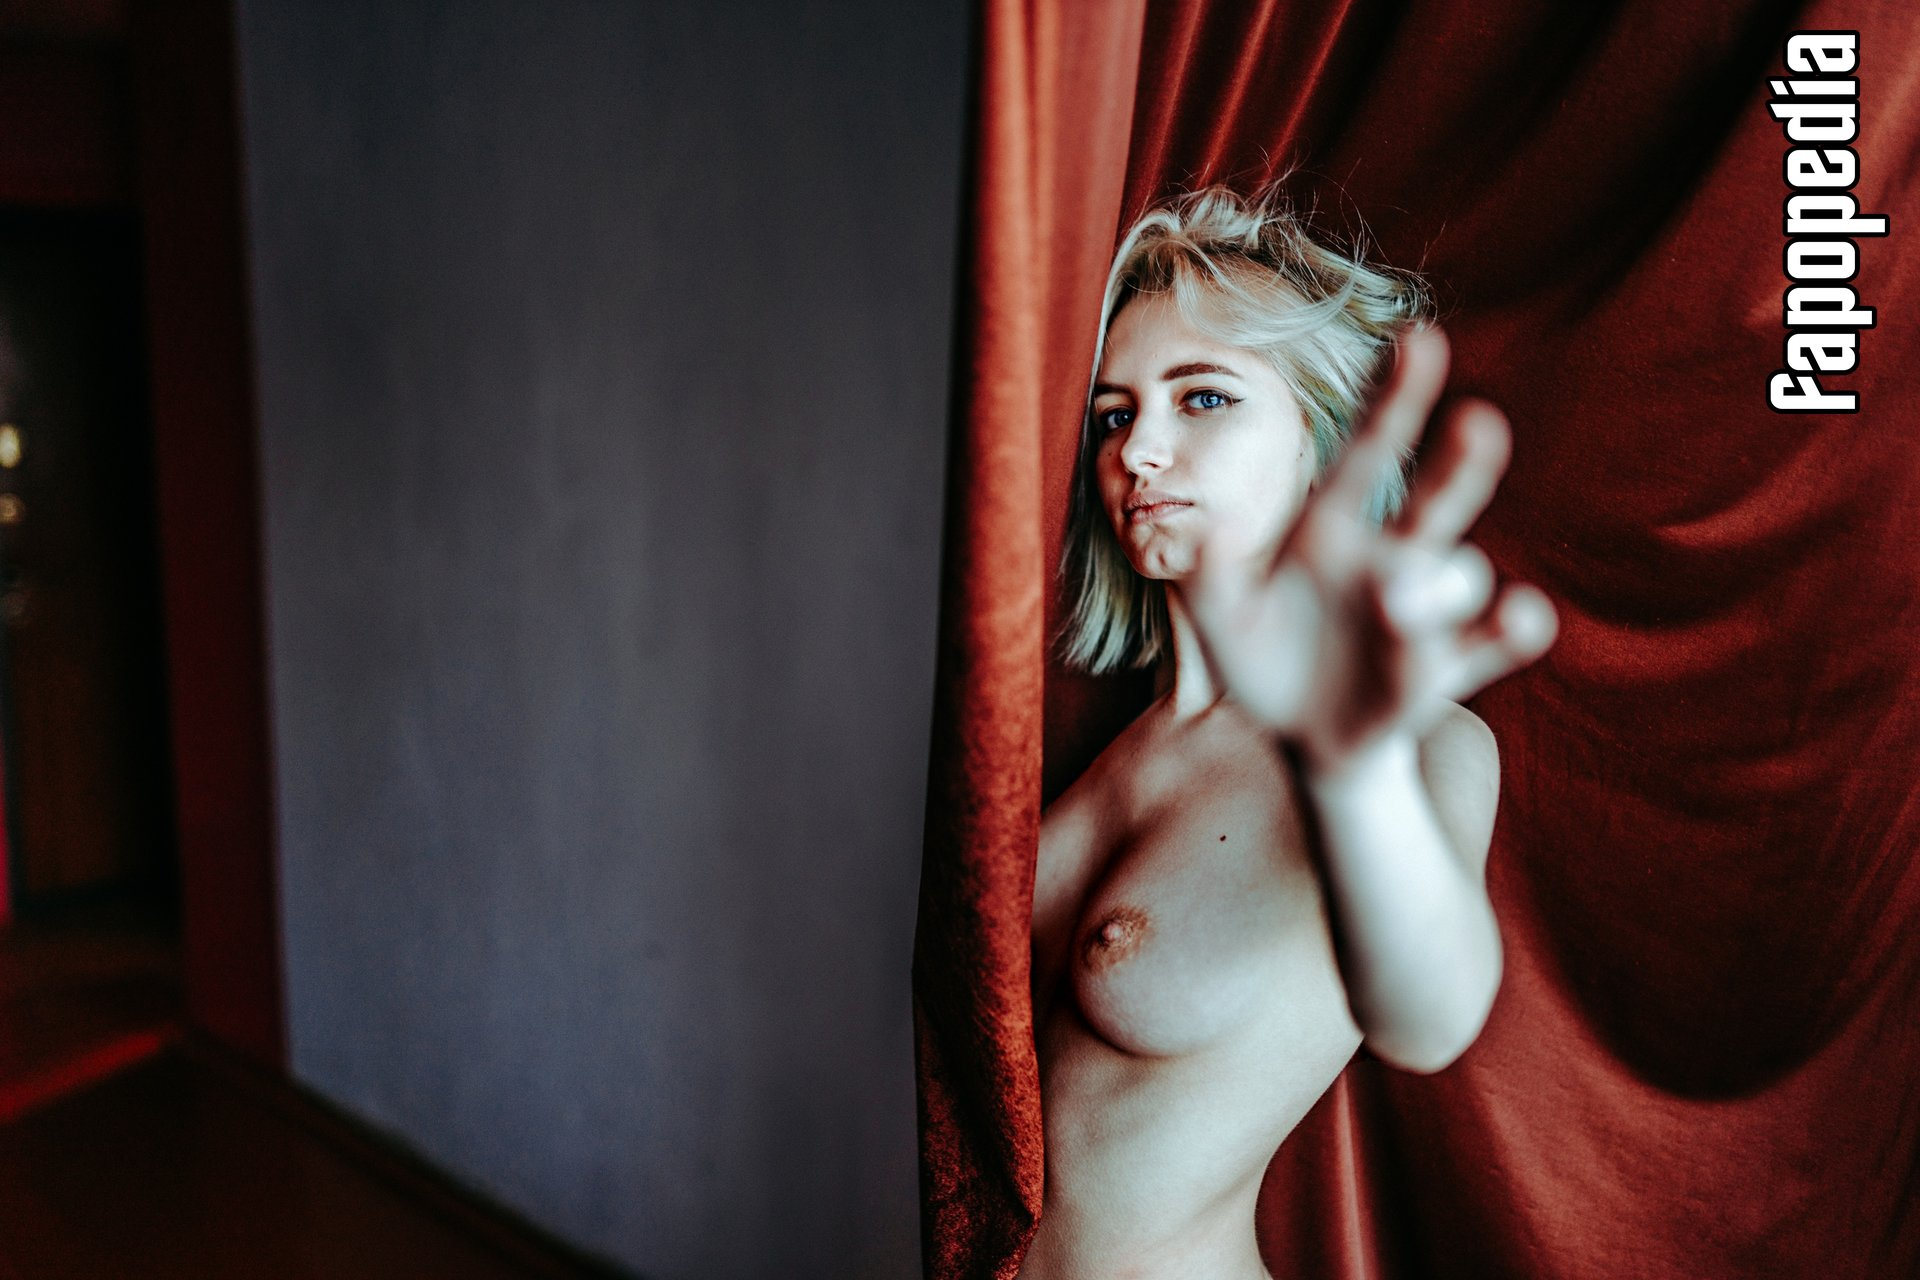 Margarita Nude Leaks